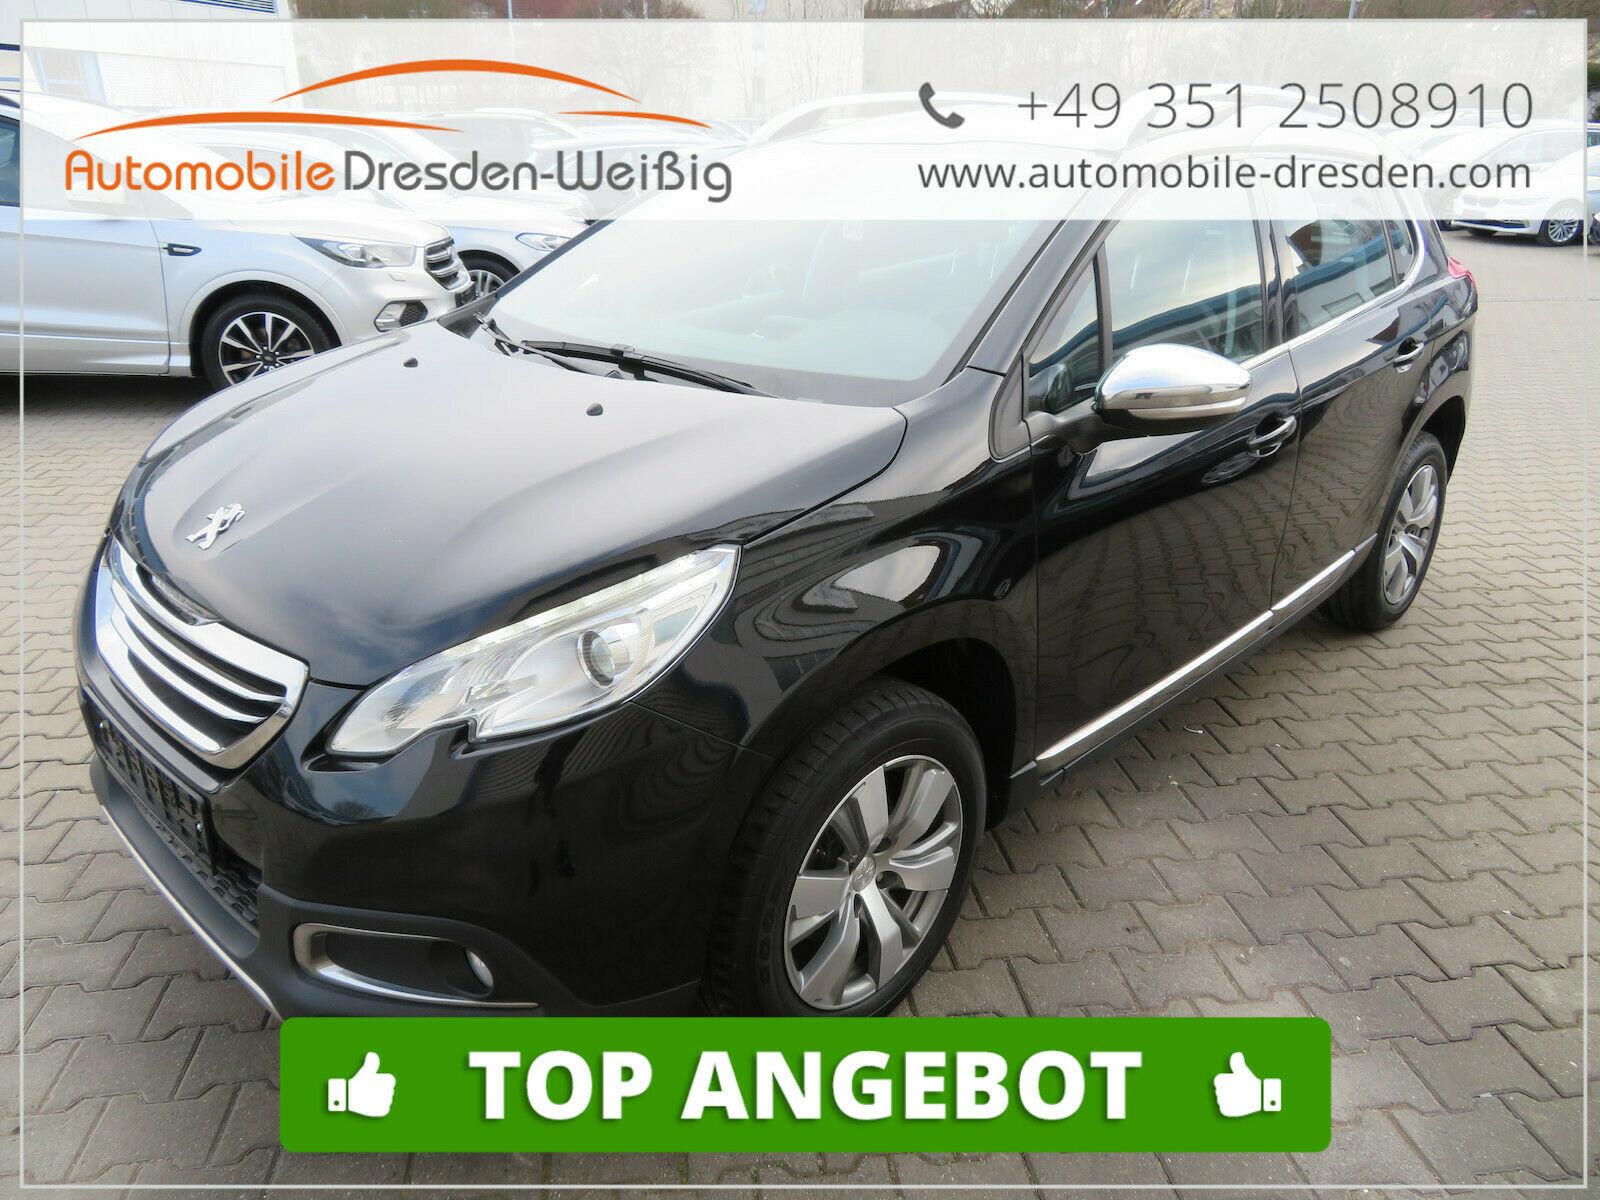 Peugeot 2008 1.6 HDI Allure*Navi*Leder*Sportsitze, Jahr 2015, Diesel